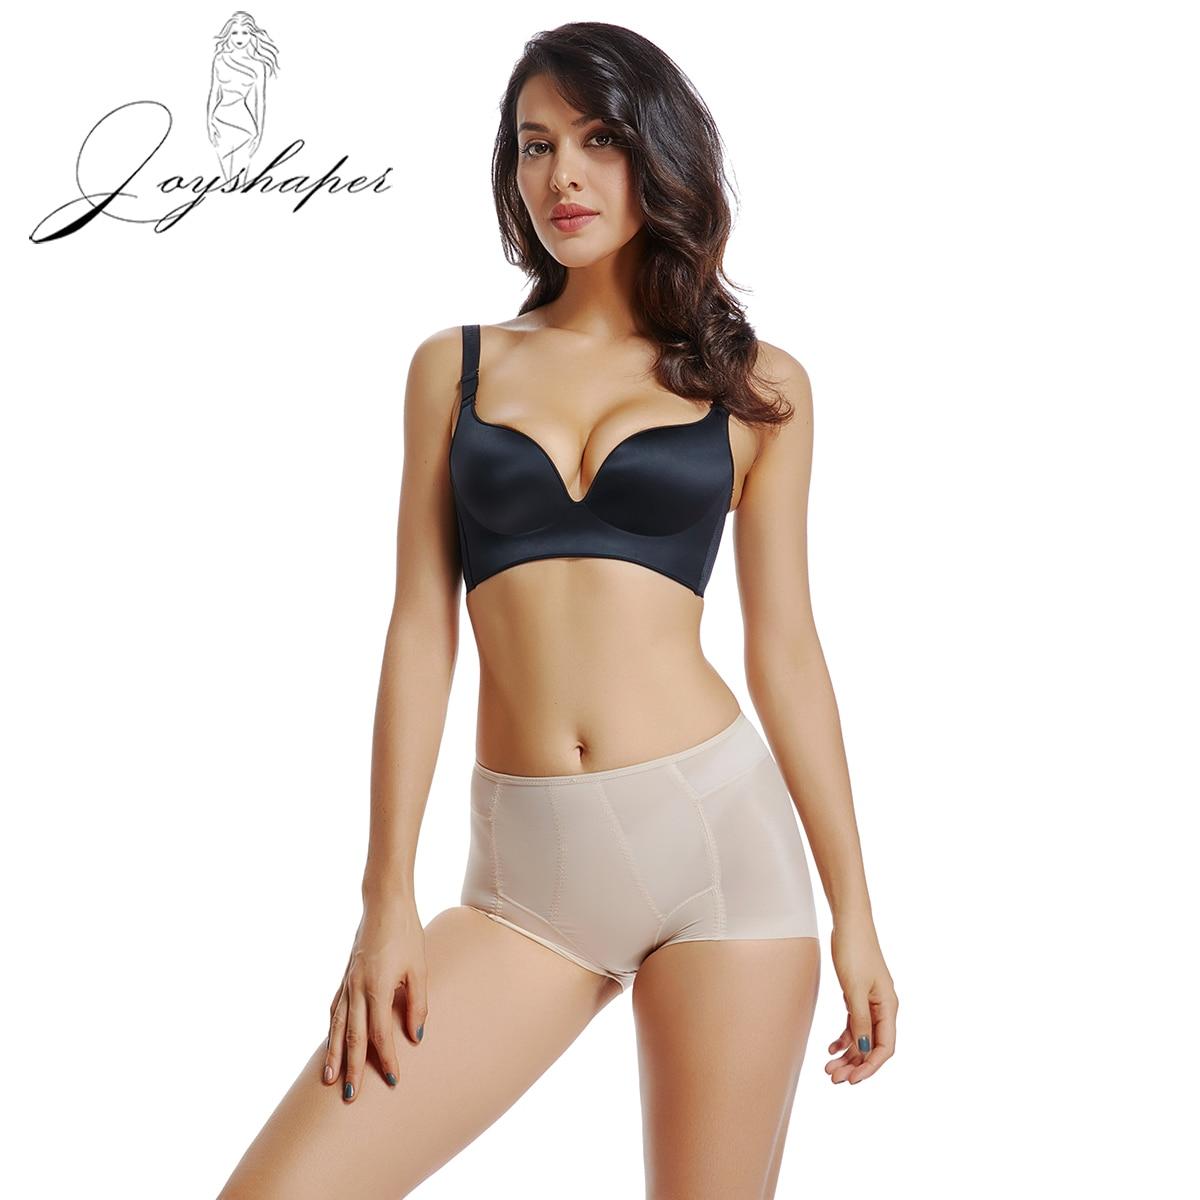 Joyshaper nuevas bragas para mujeres Plus tamaño transpirable bragas Tanga barriga Control Bikini elástico ropa interior Mujer ropa interior de moda Boyshorts